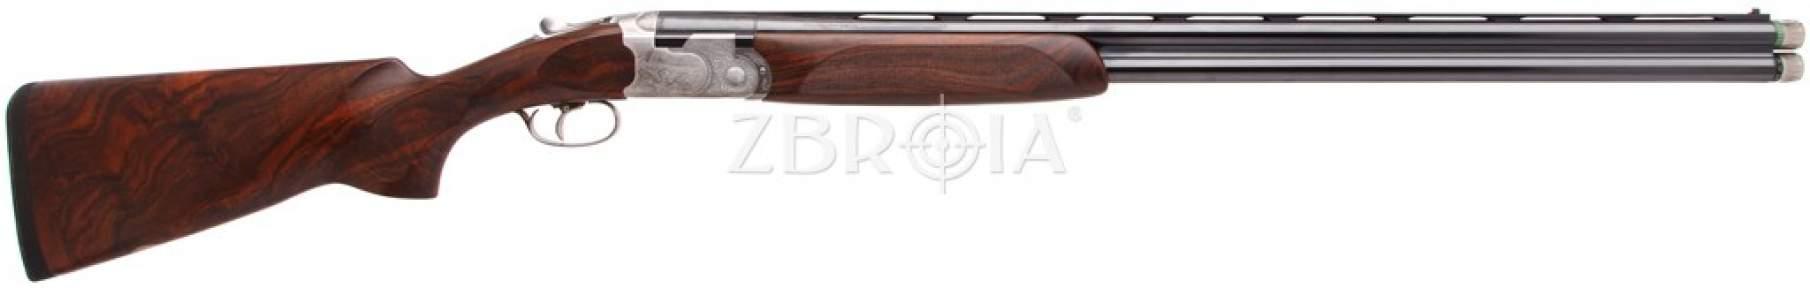 Ружье Beretta 687 Silver Pigeon III LTD Sporting кал. 12/76